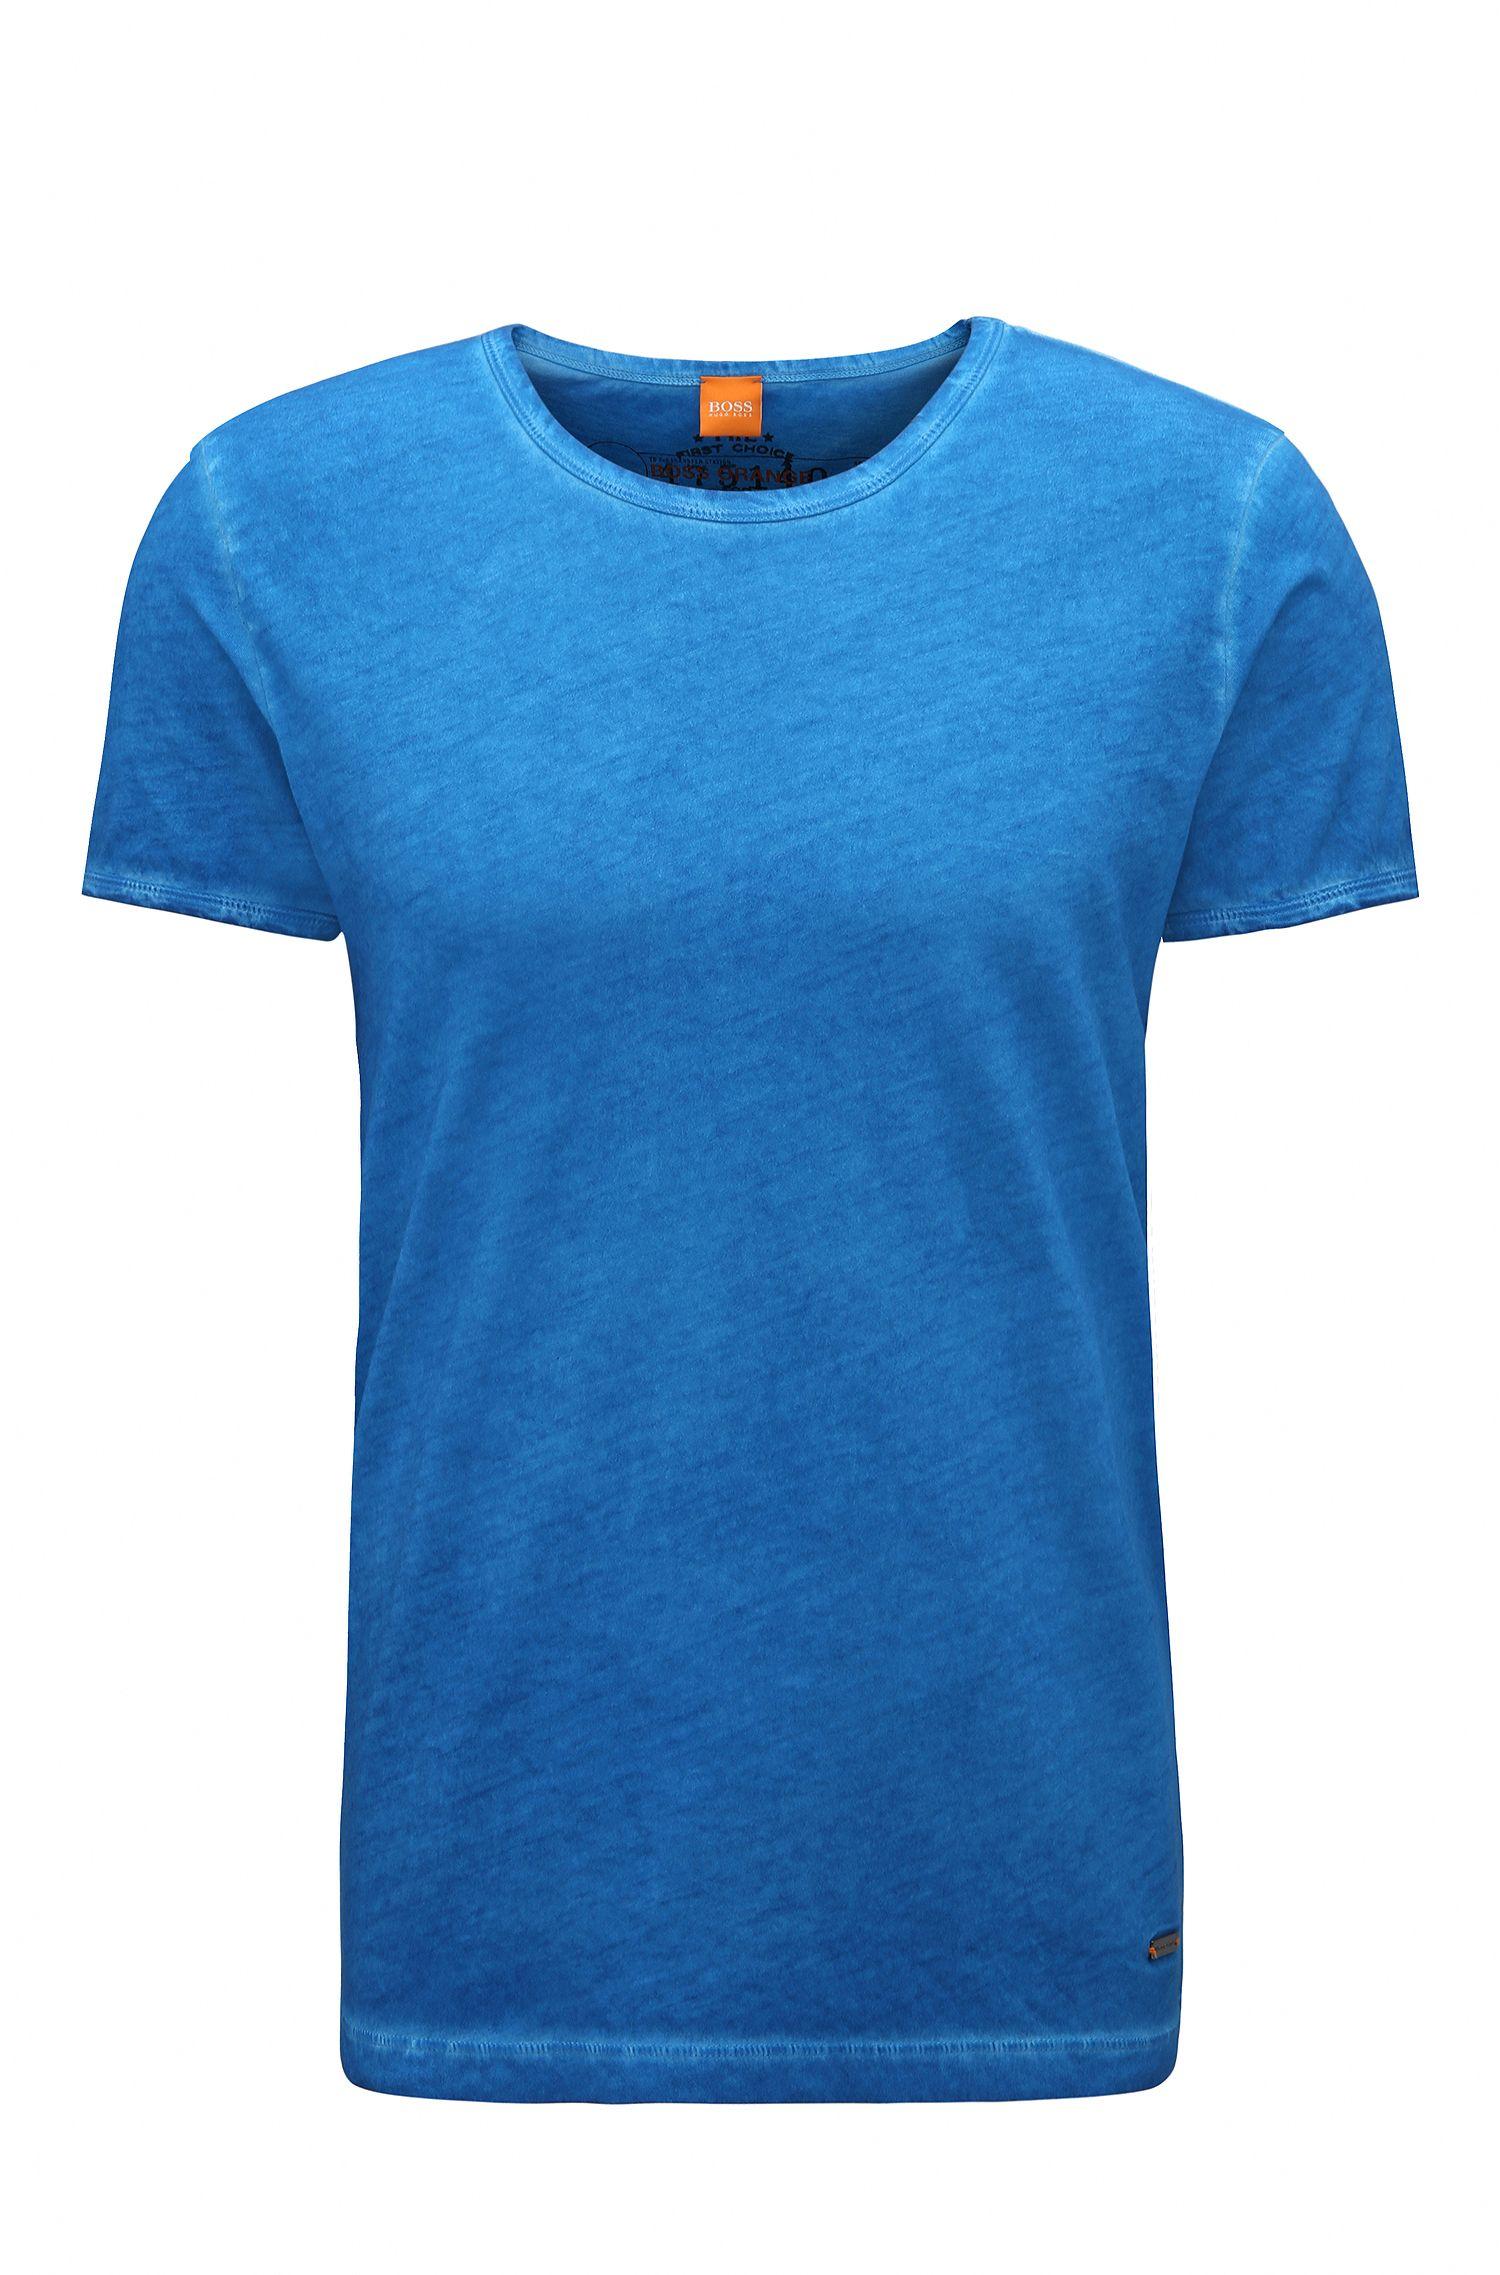 Cotton Garment Washed T-Shirt   Tour